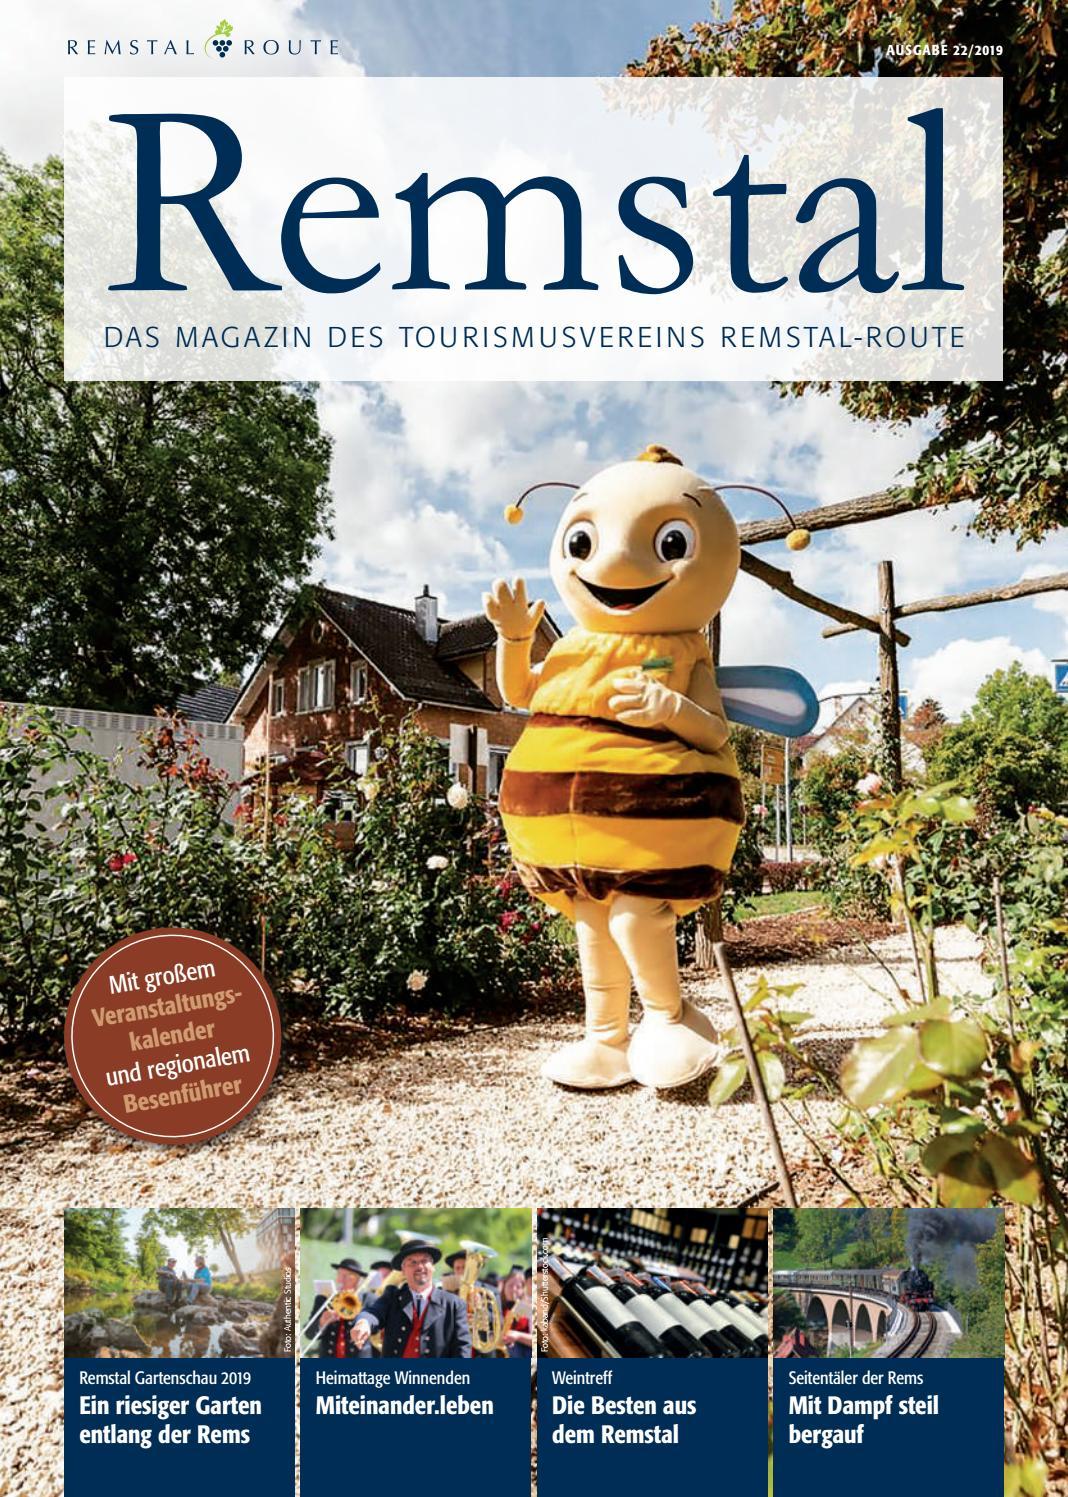 26a9bc9adb48 Remstal Magazin, Ausgabe 22 by Tourismusverein Remstal-Route e.V. ...